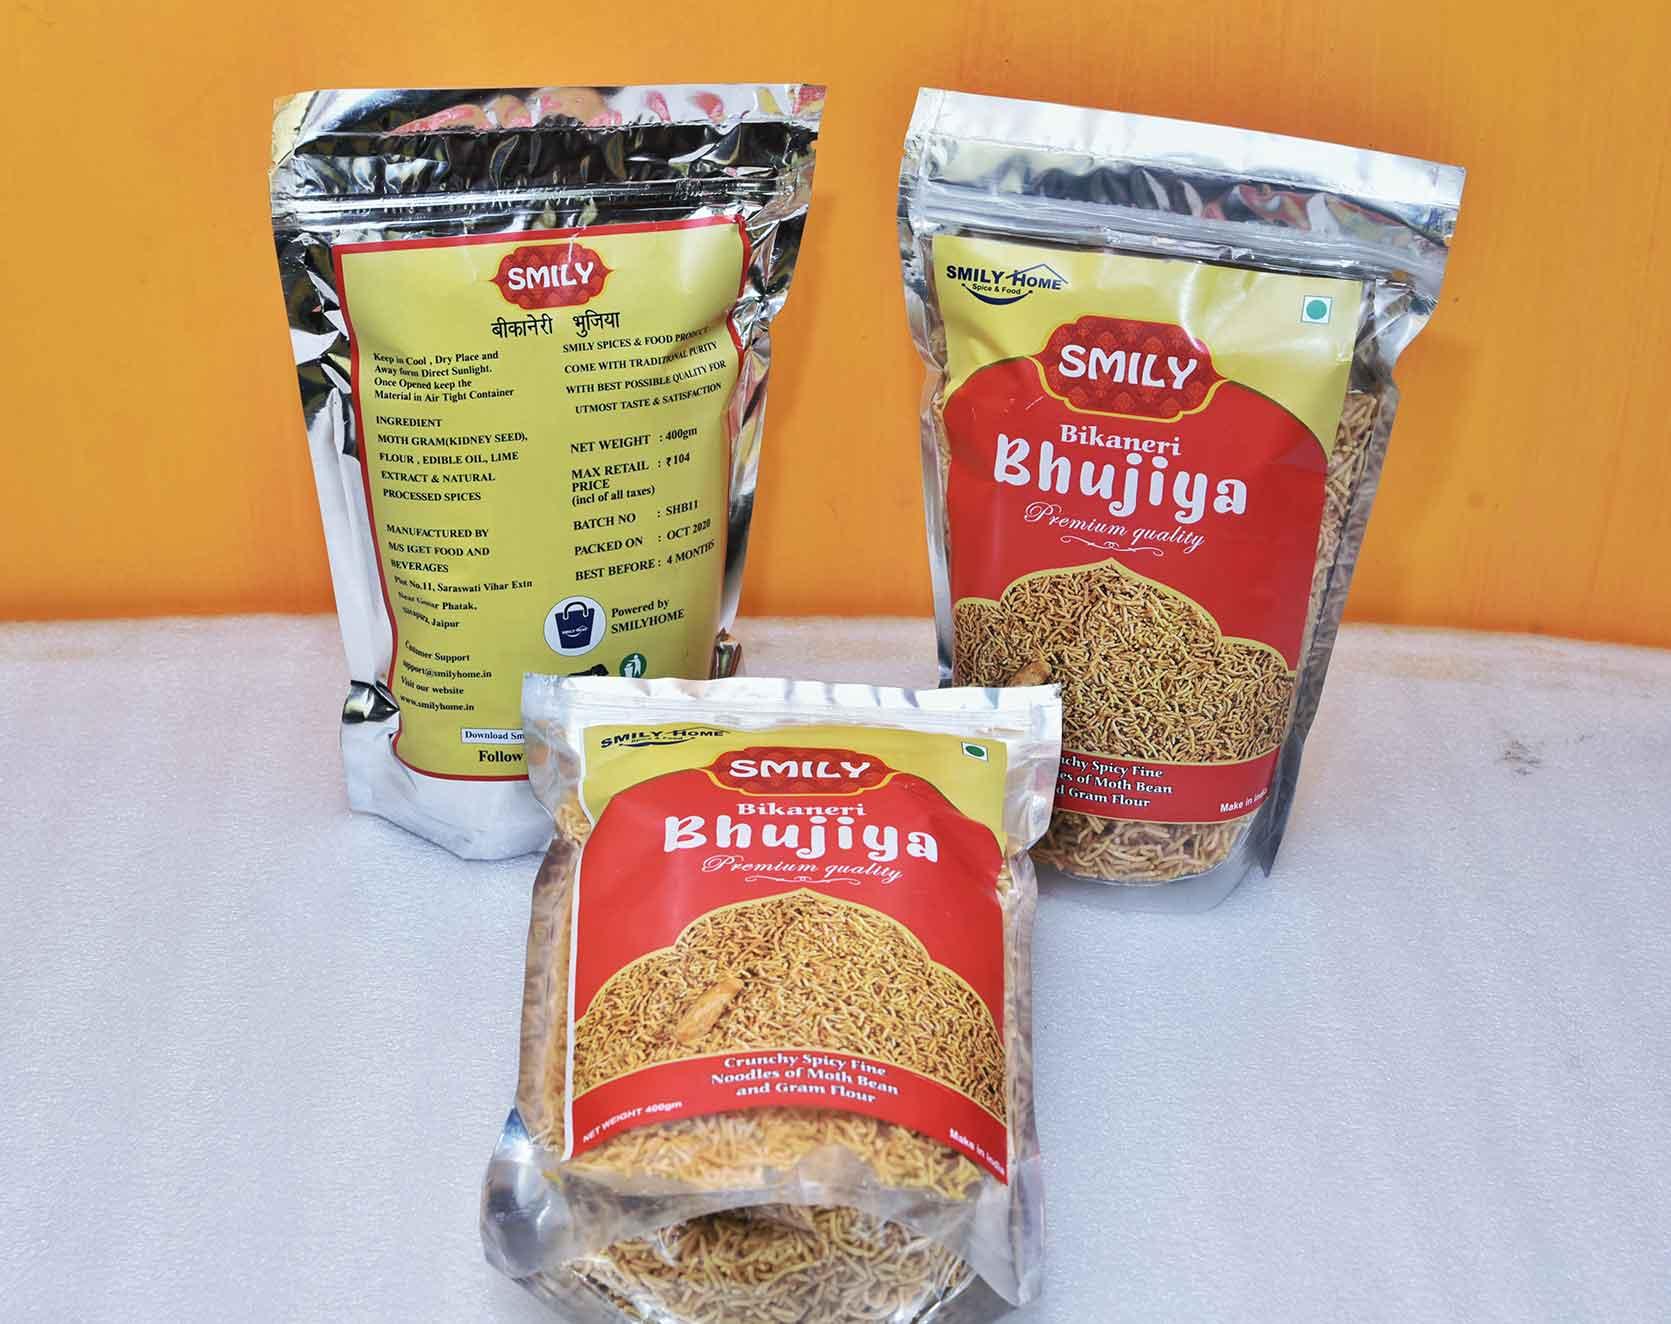 Smily Bikaneri Bhujia (1kg)